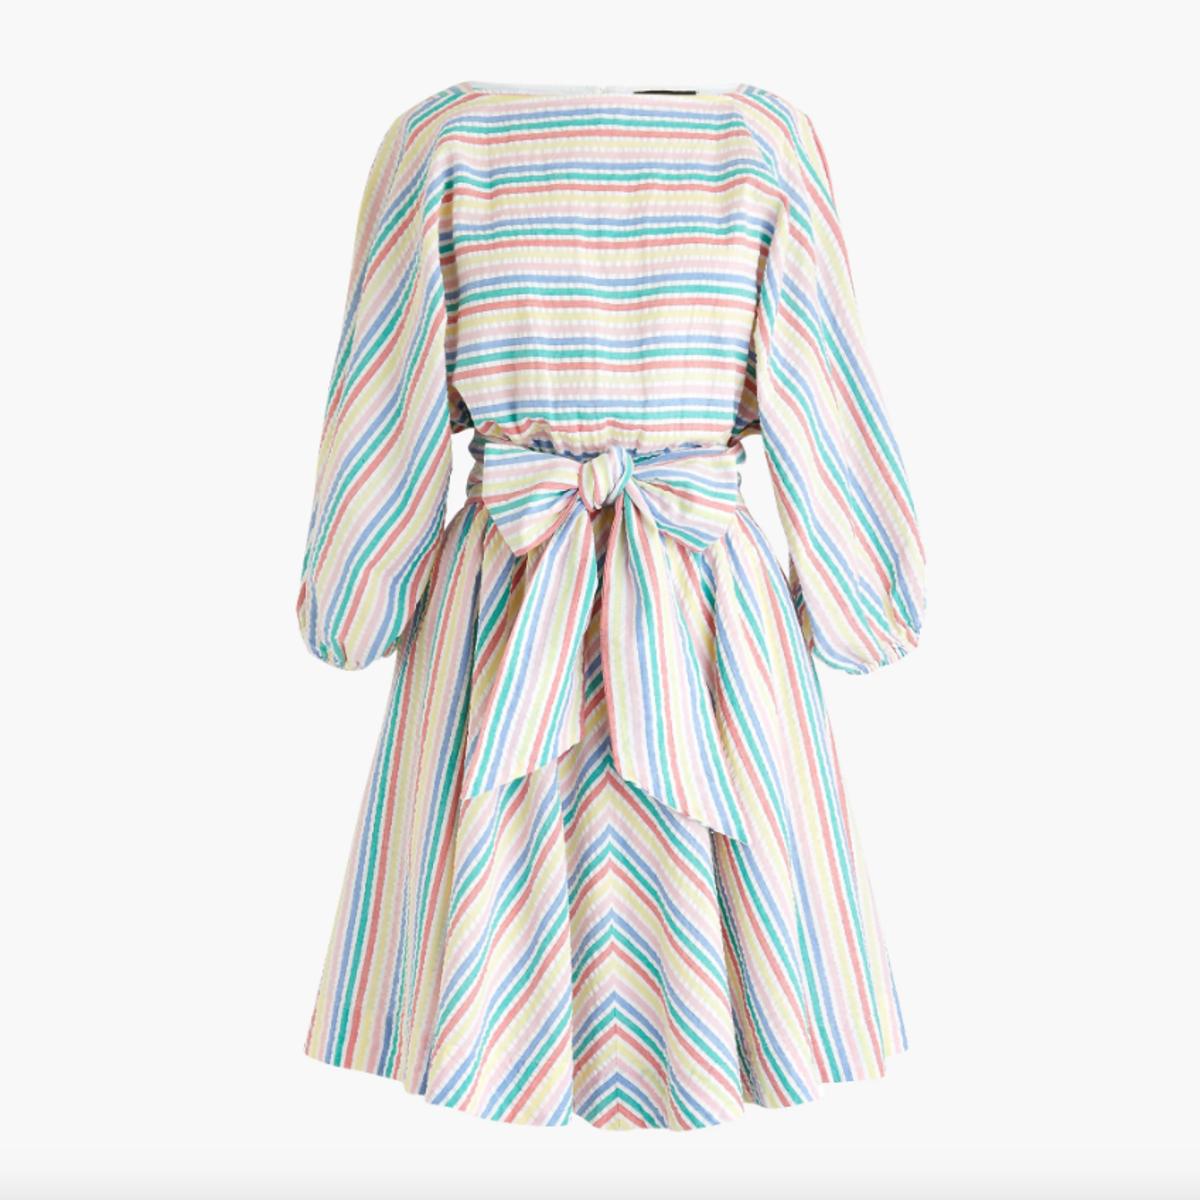 J.Crew Dolman-Sleeve Mini Dress in Rainbow Seersucker, $118, available here.